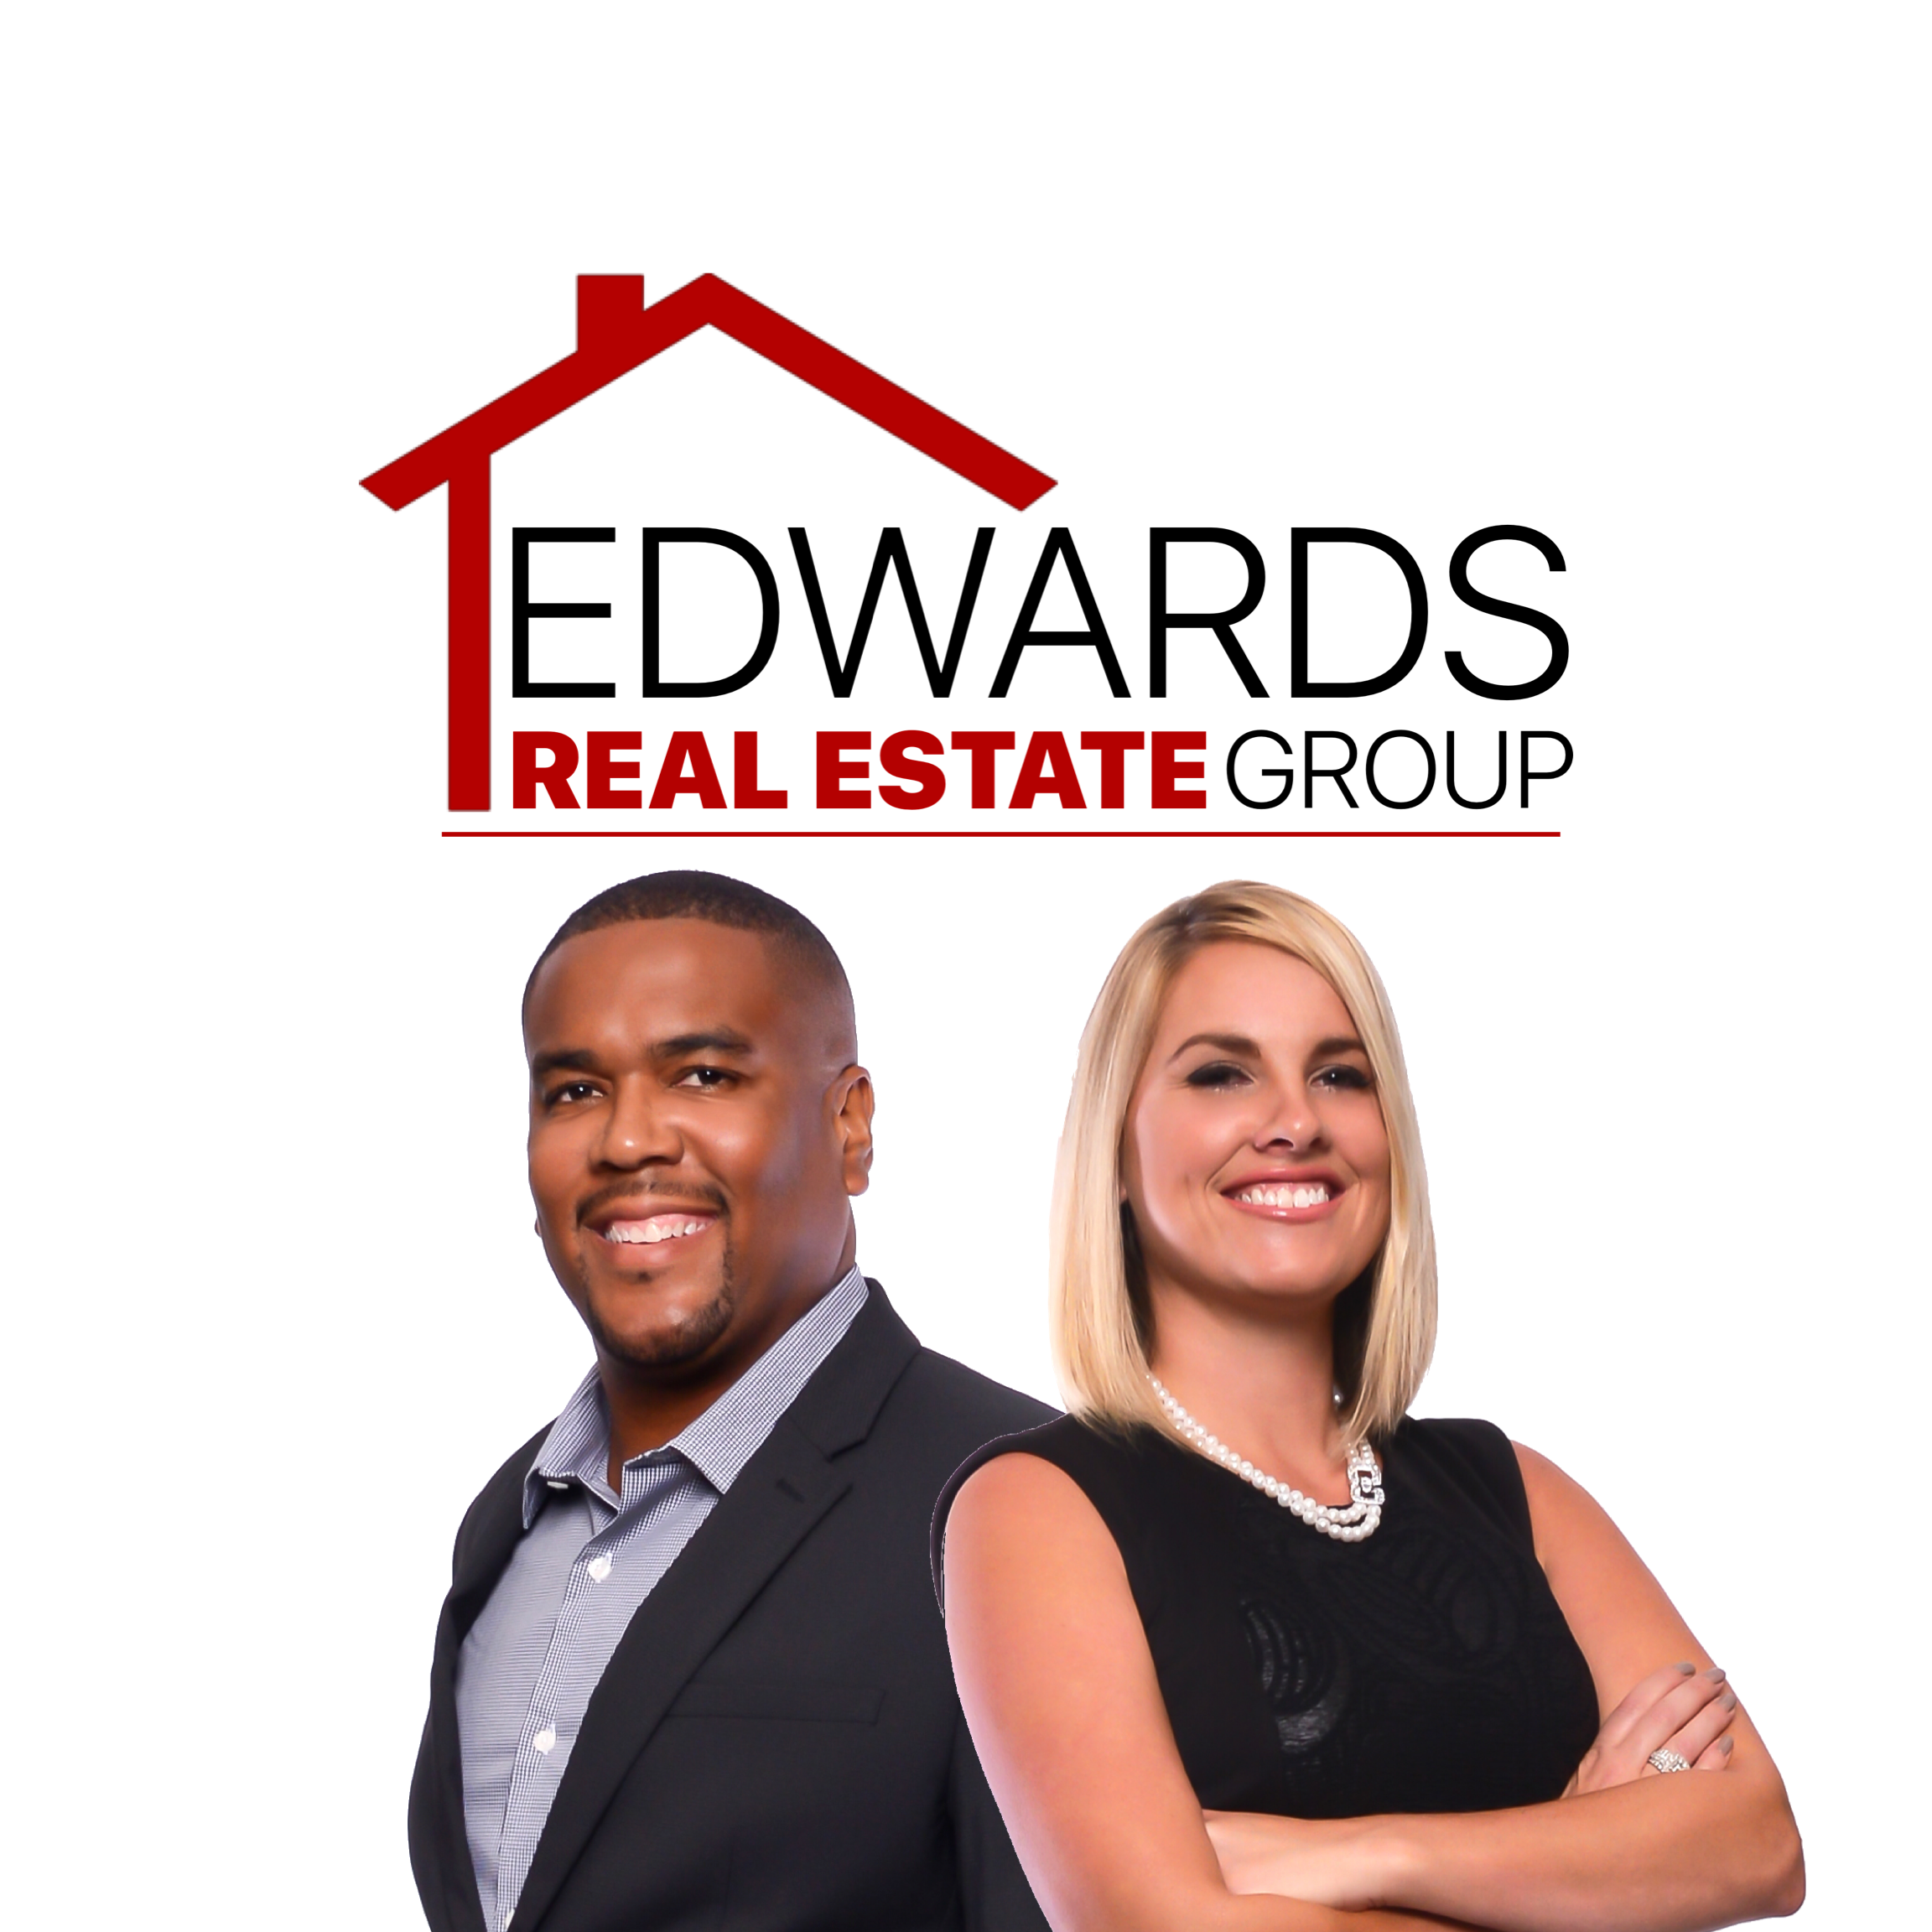 Corey & Heather Edwards with The Edwards Real Estate Group